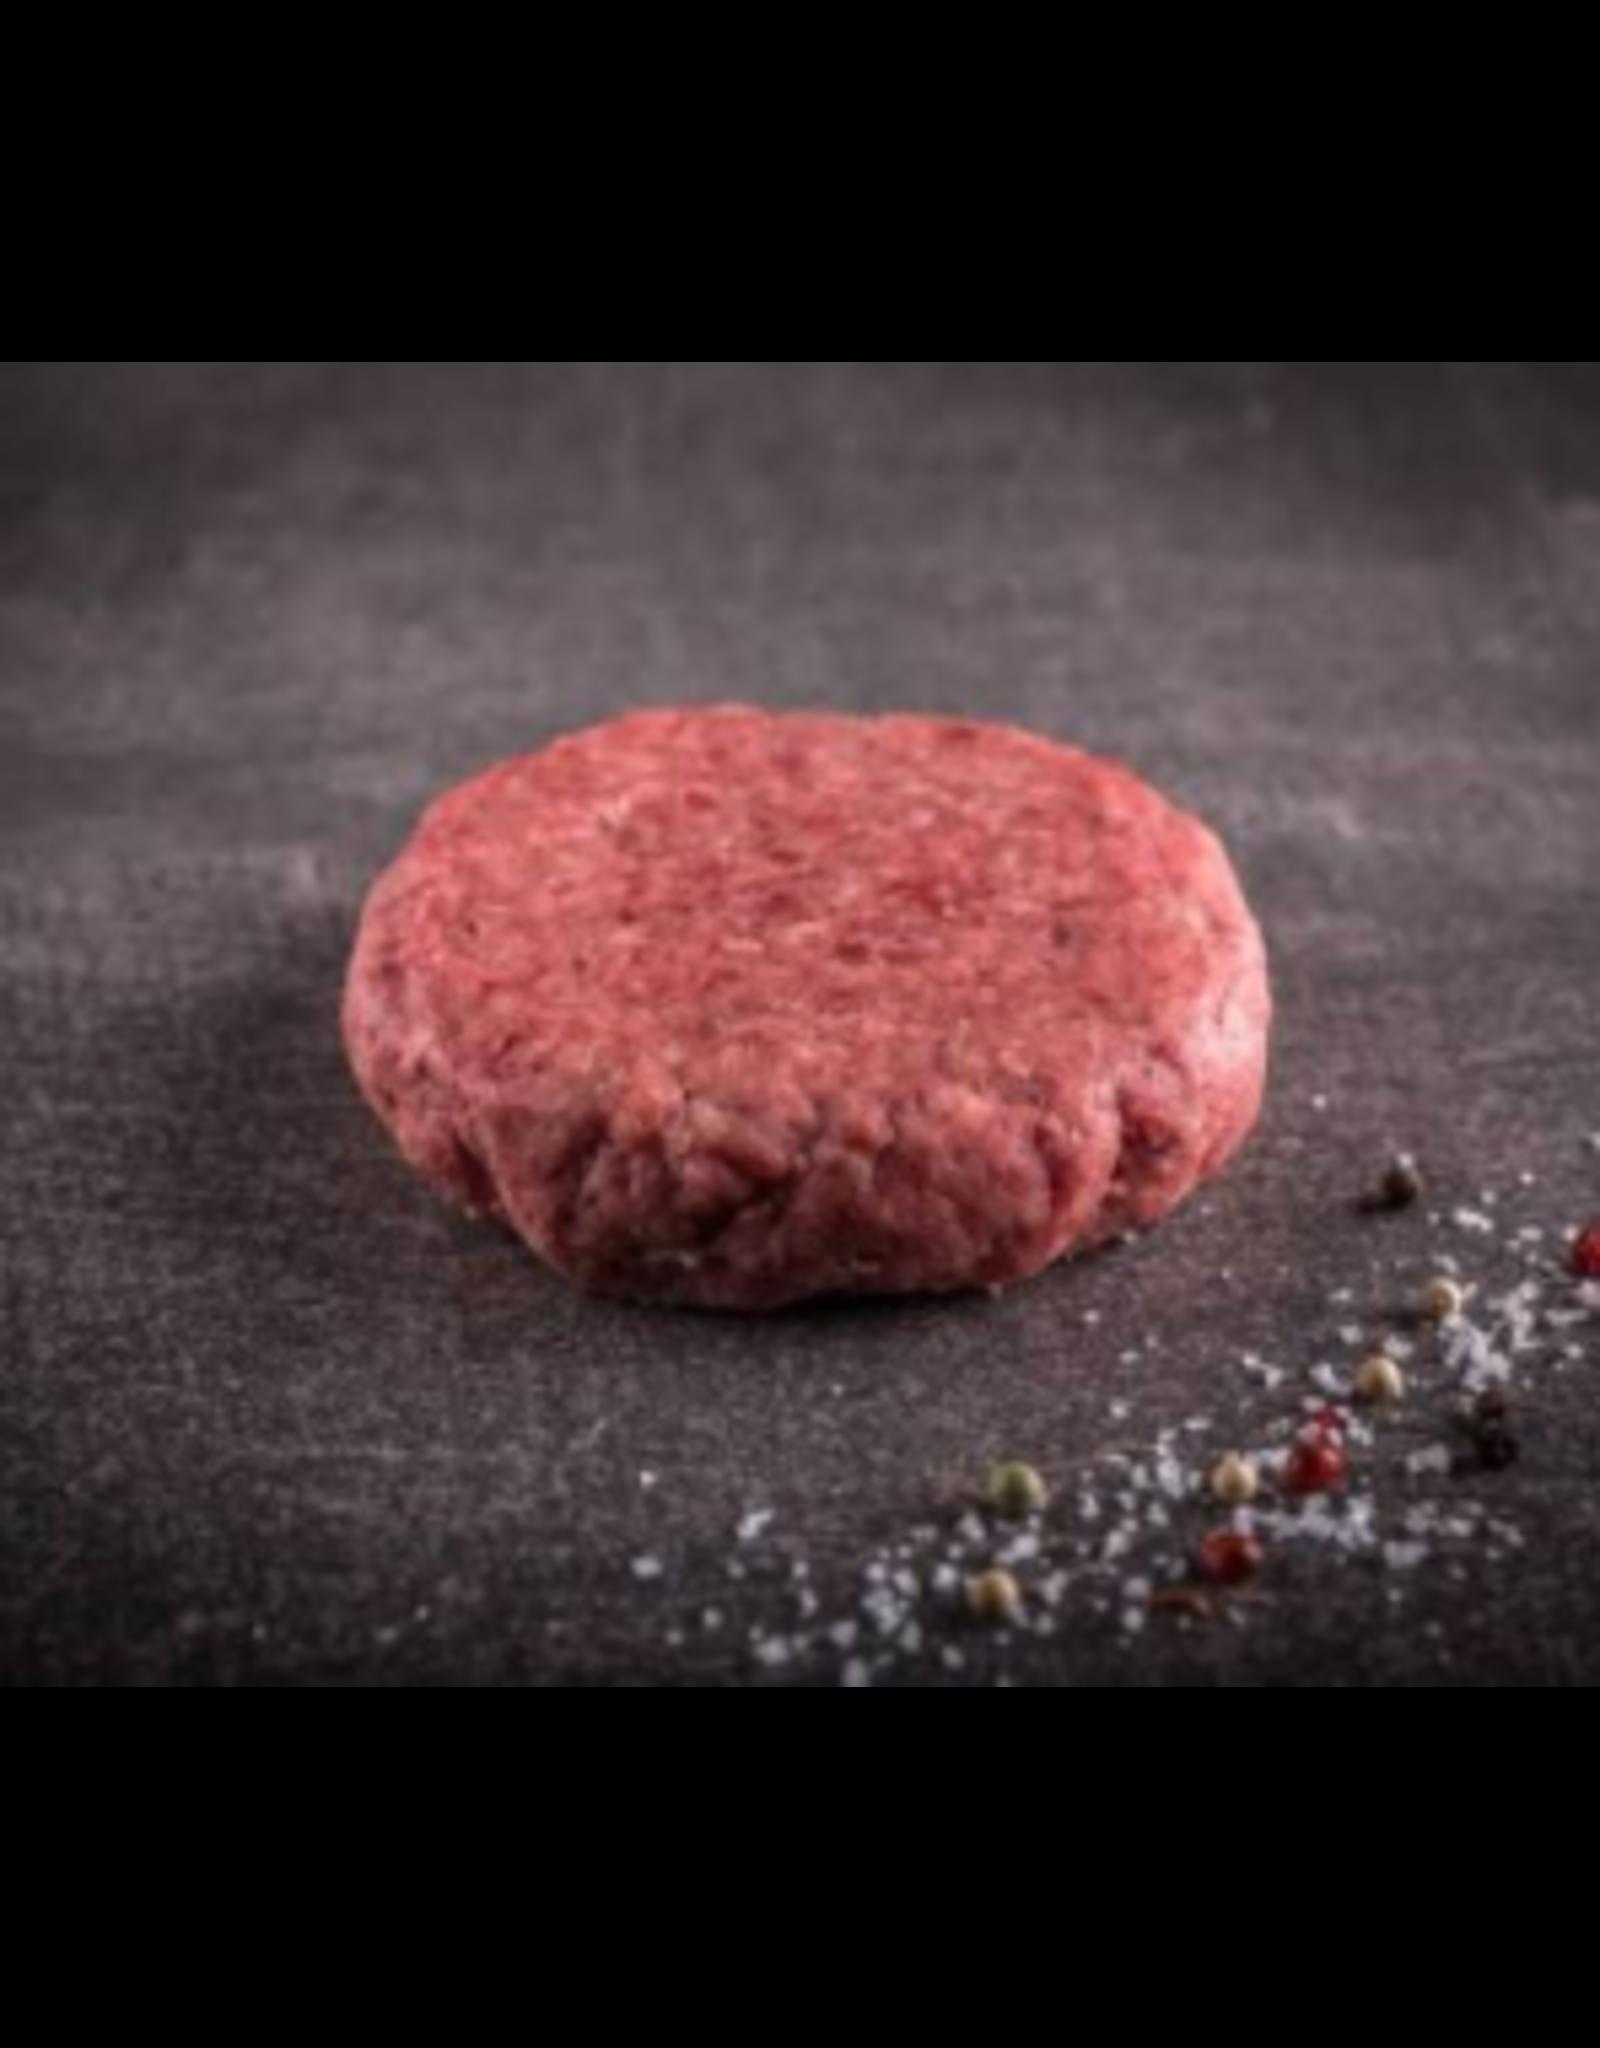 Beyond Burger 2x113g ❄️❄️❄️ - OFERTA